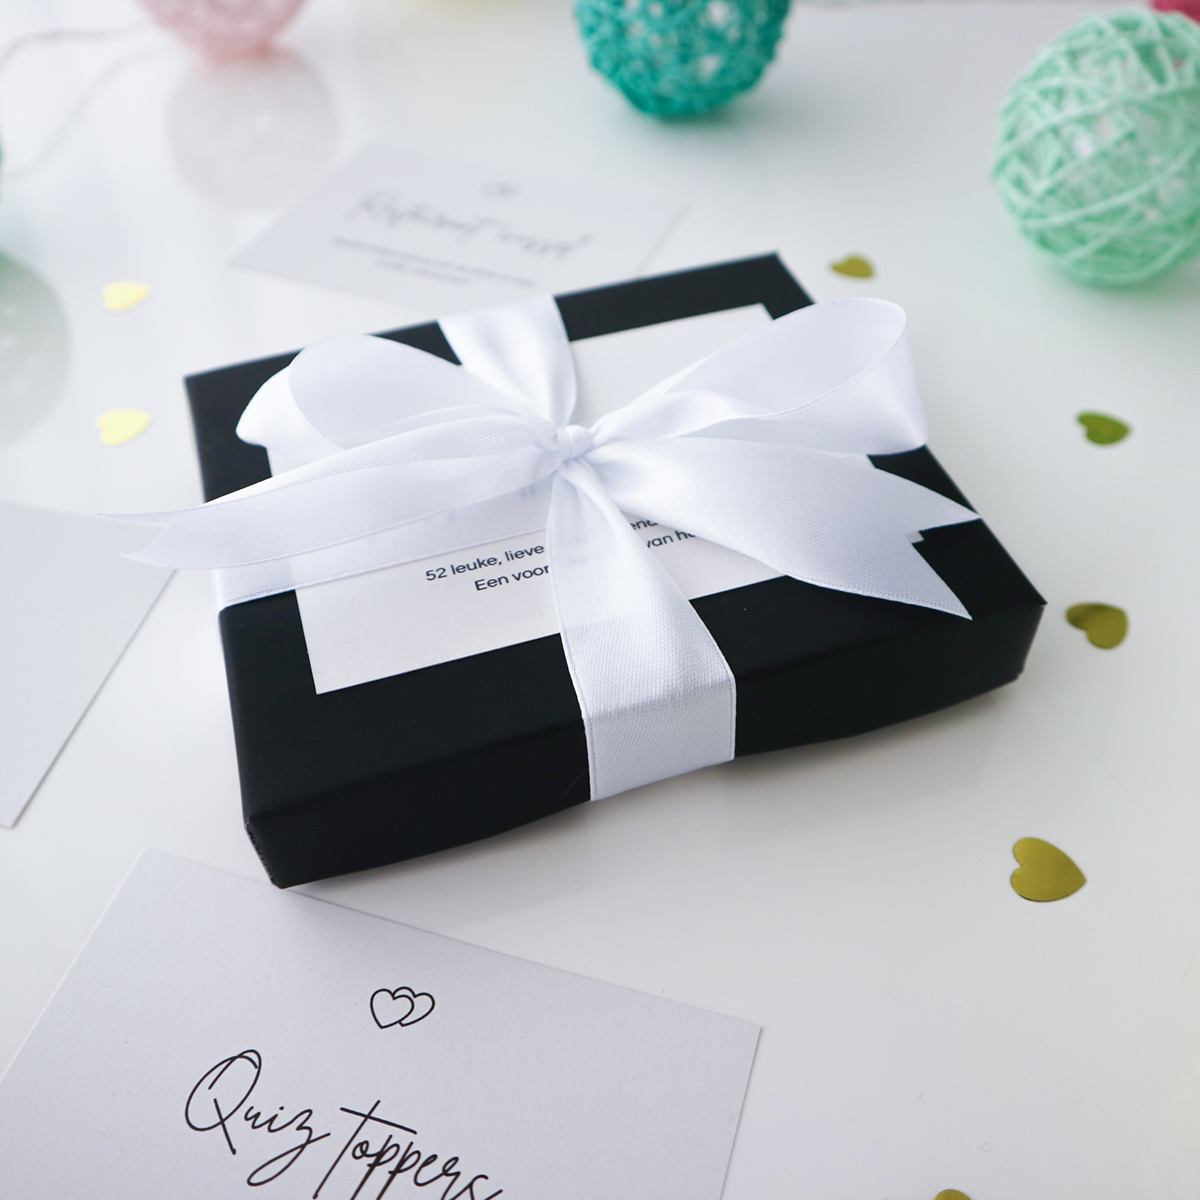 Date ideeën box gepersonaliseerd cadeau